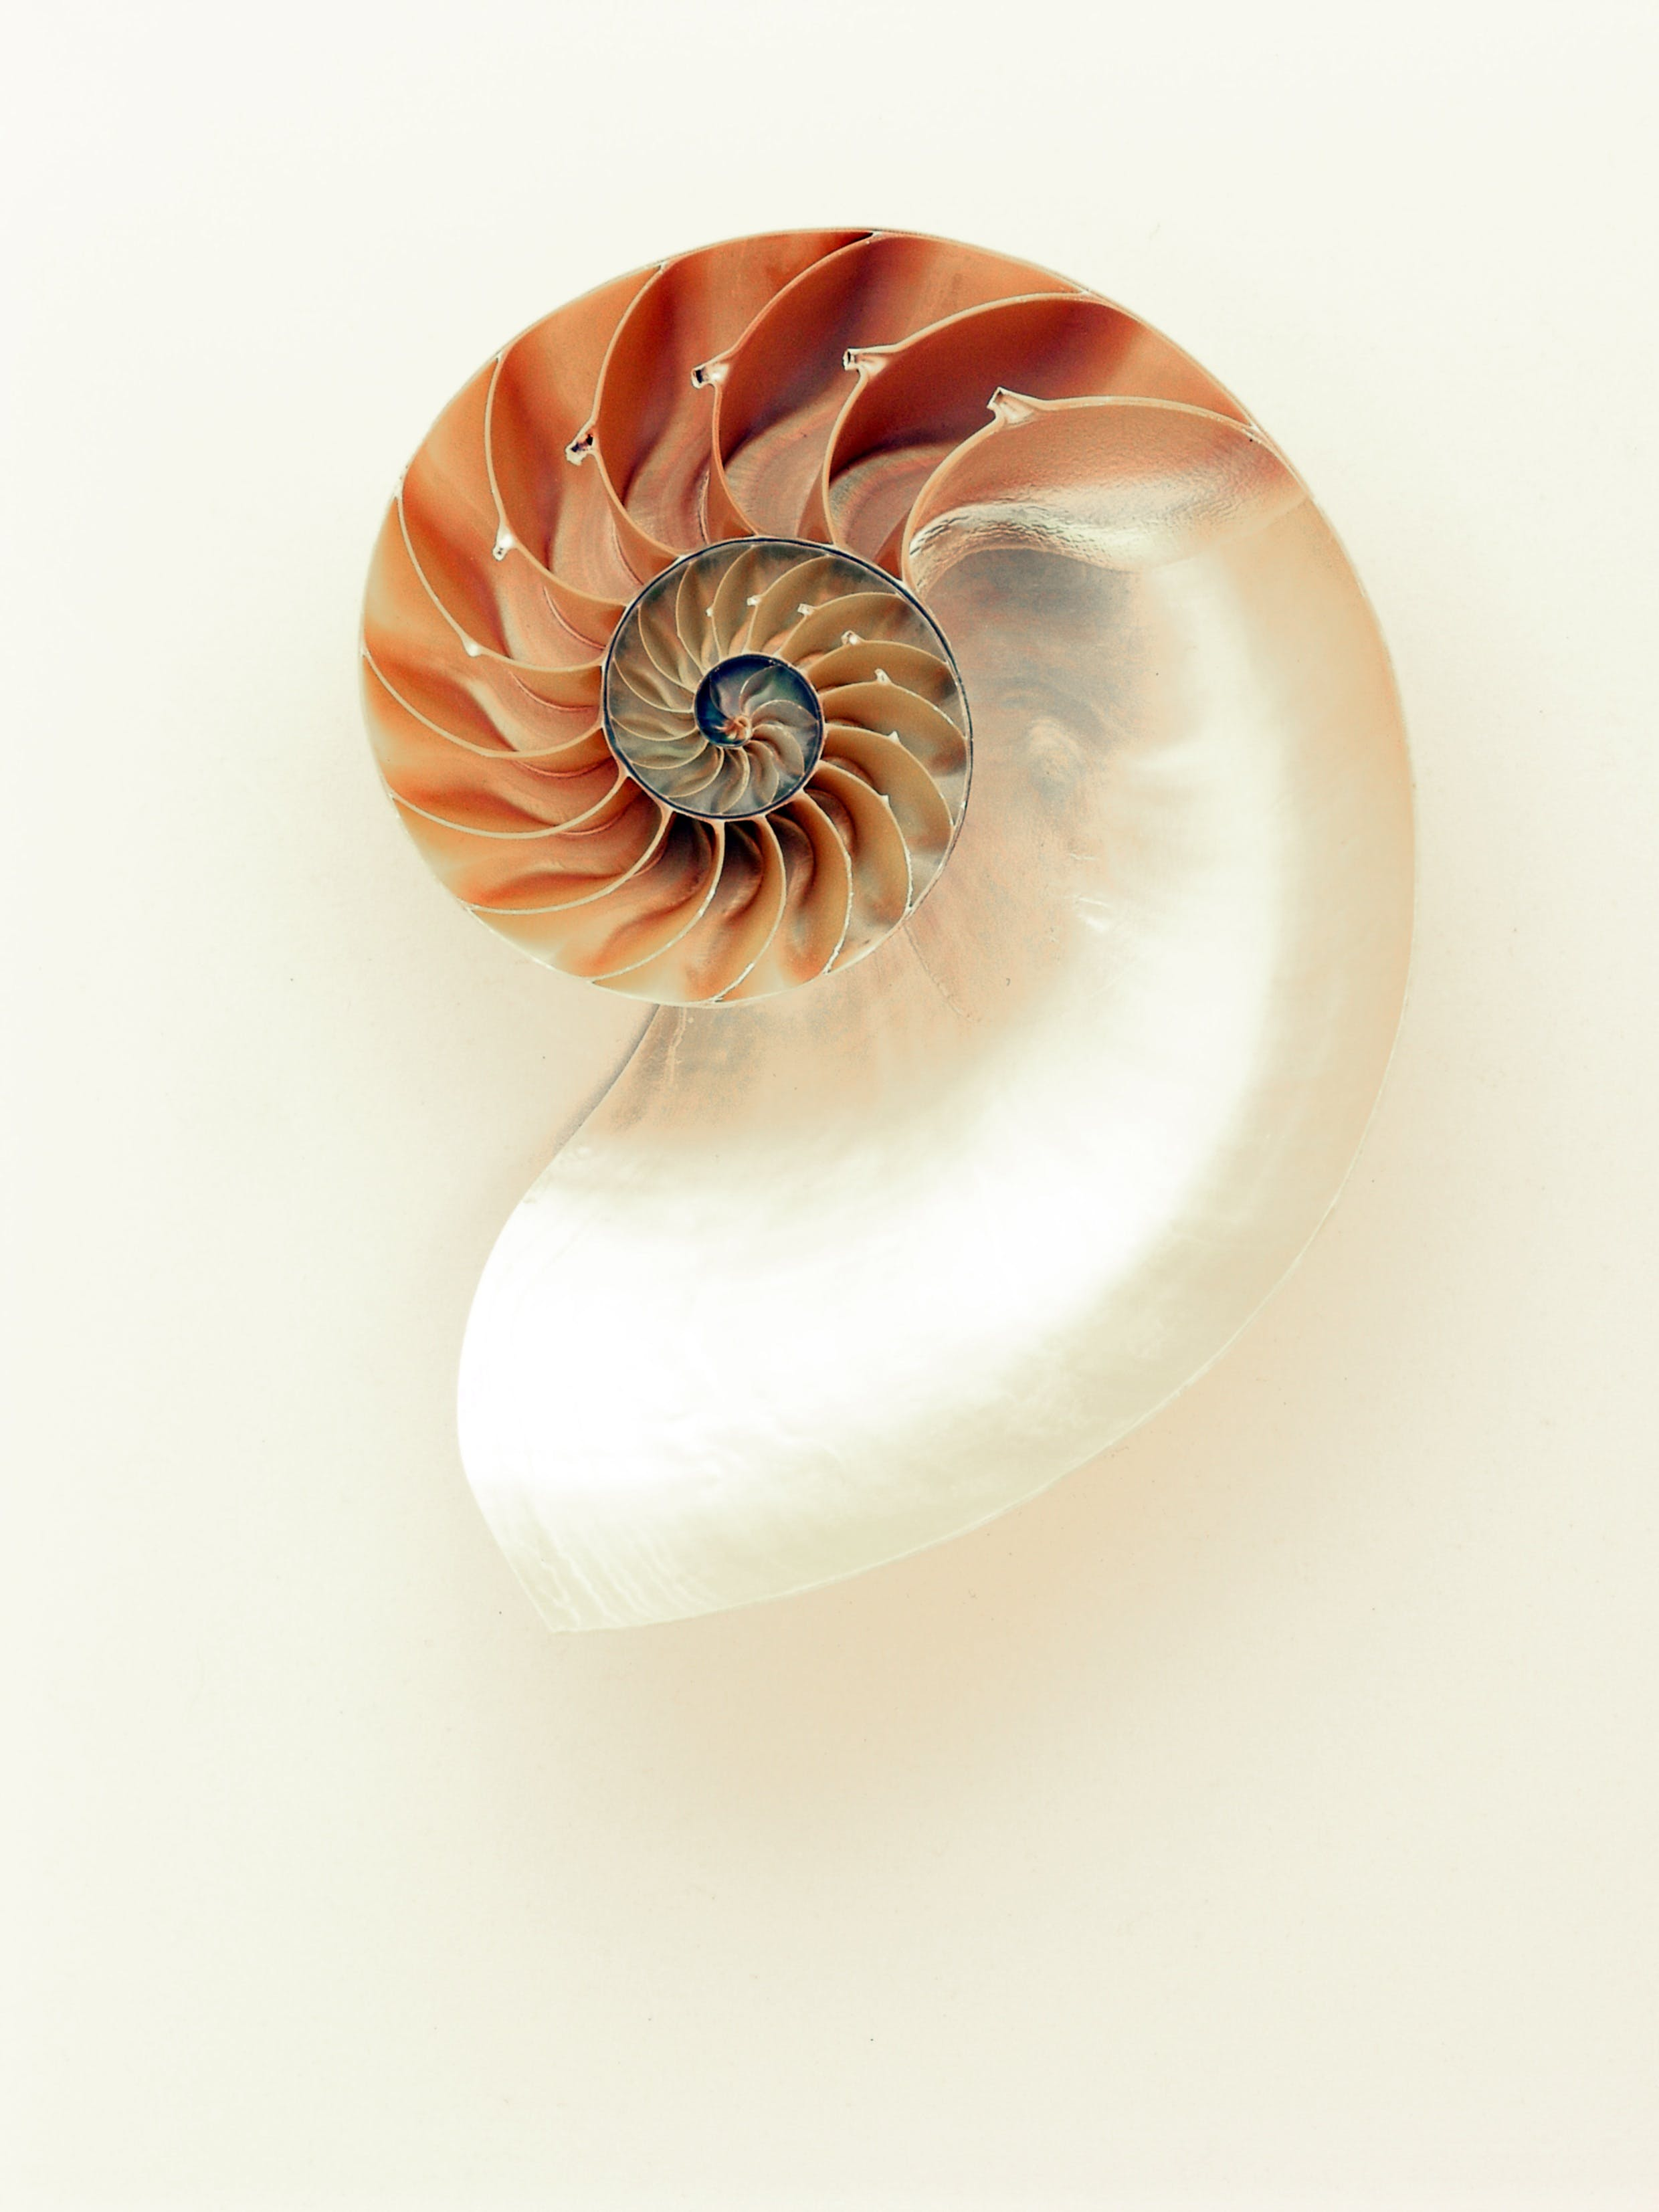 Kostenloses Stock Foto zu mollusken, muster, nautilus, perlmutt